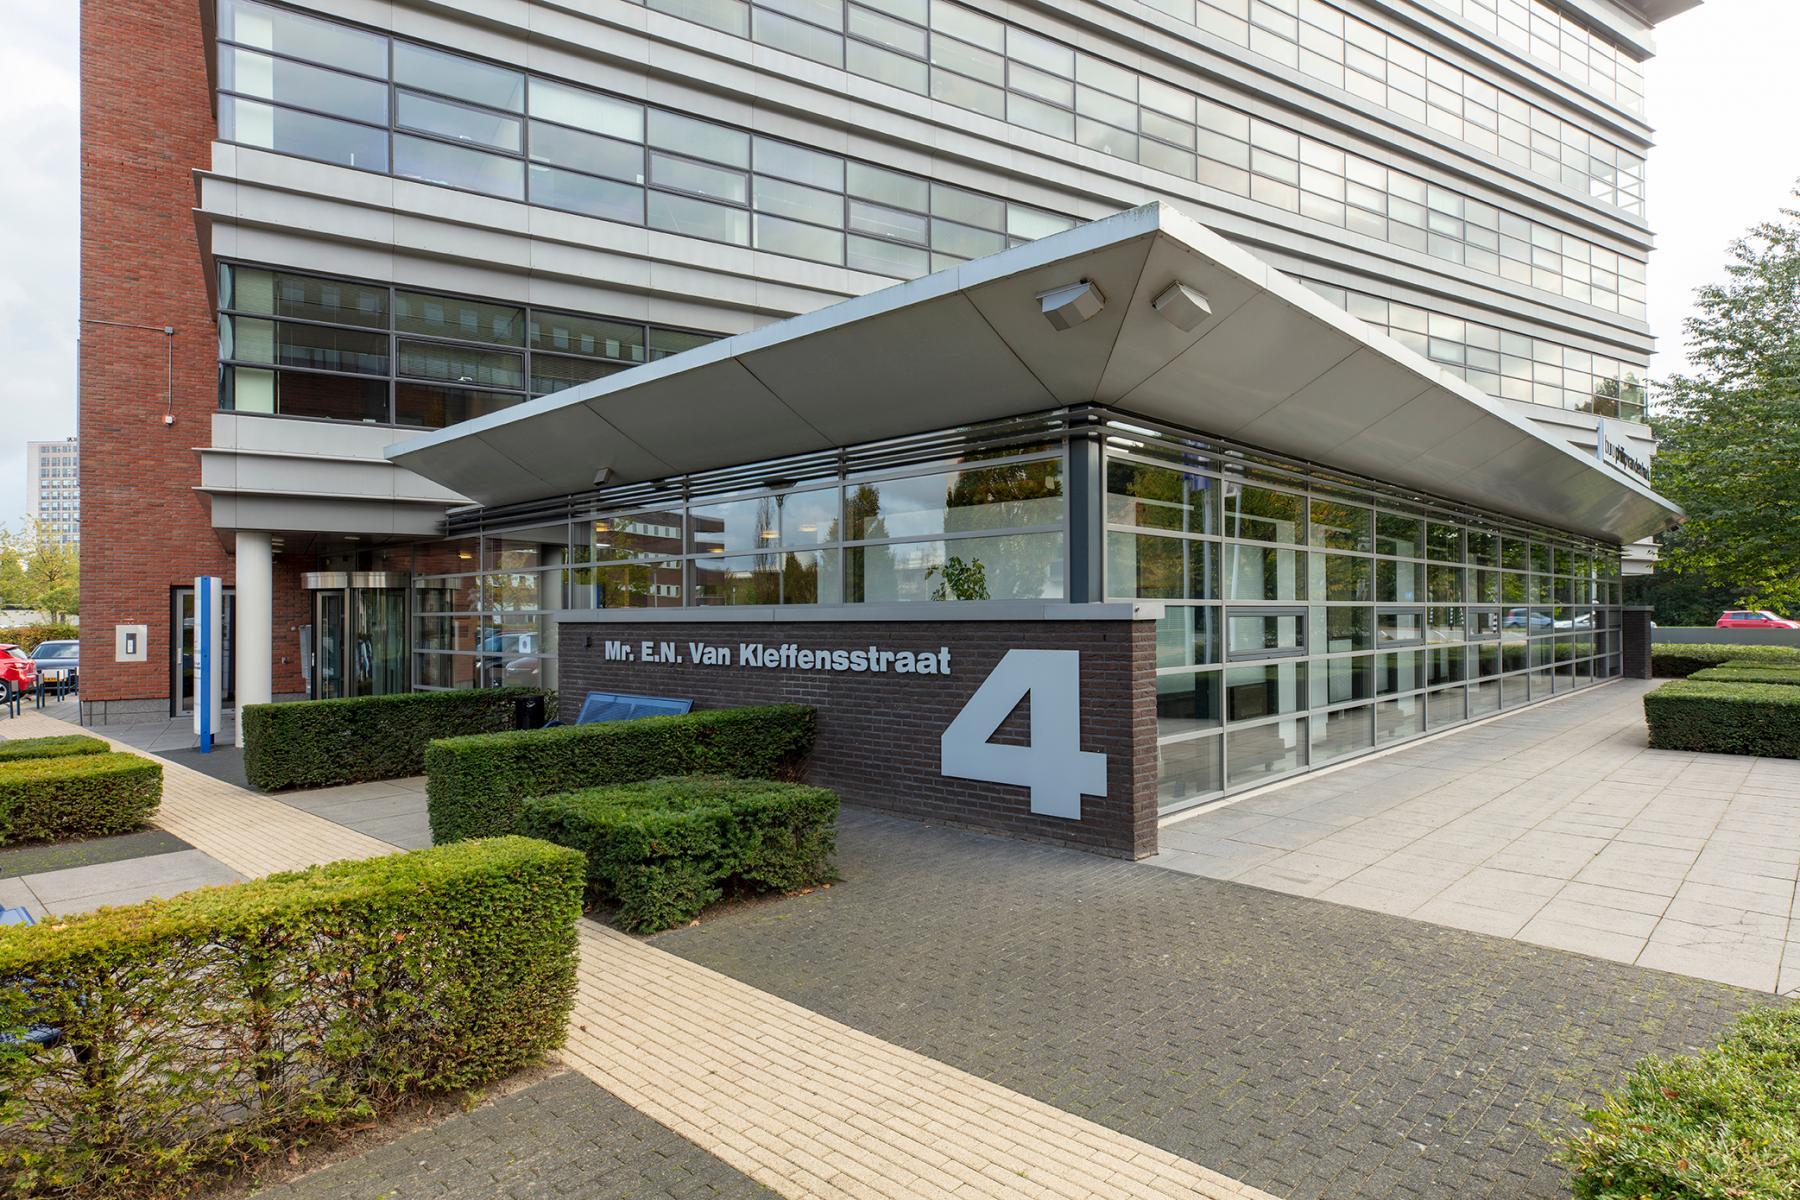 Kantoorruimte huren Mr. E.N. van Kleffenstraat 4, Arnhem (2)